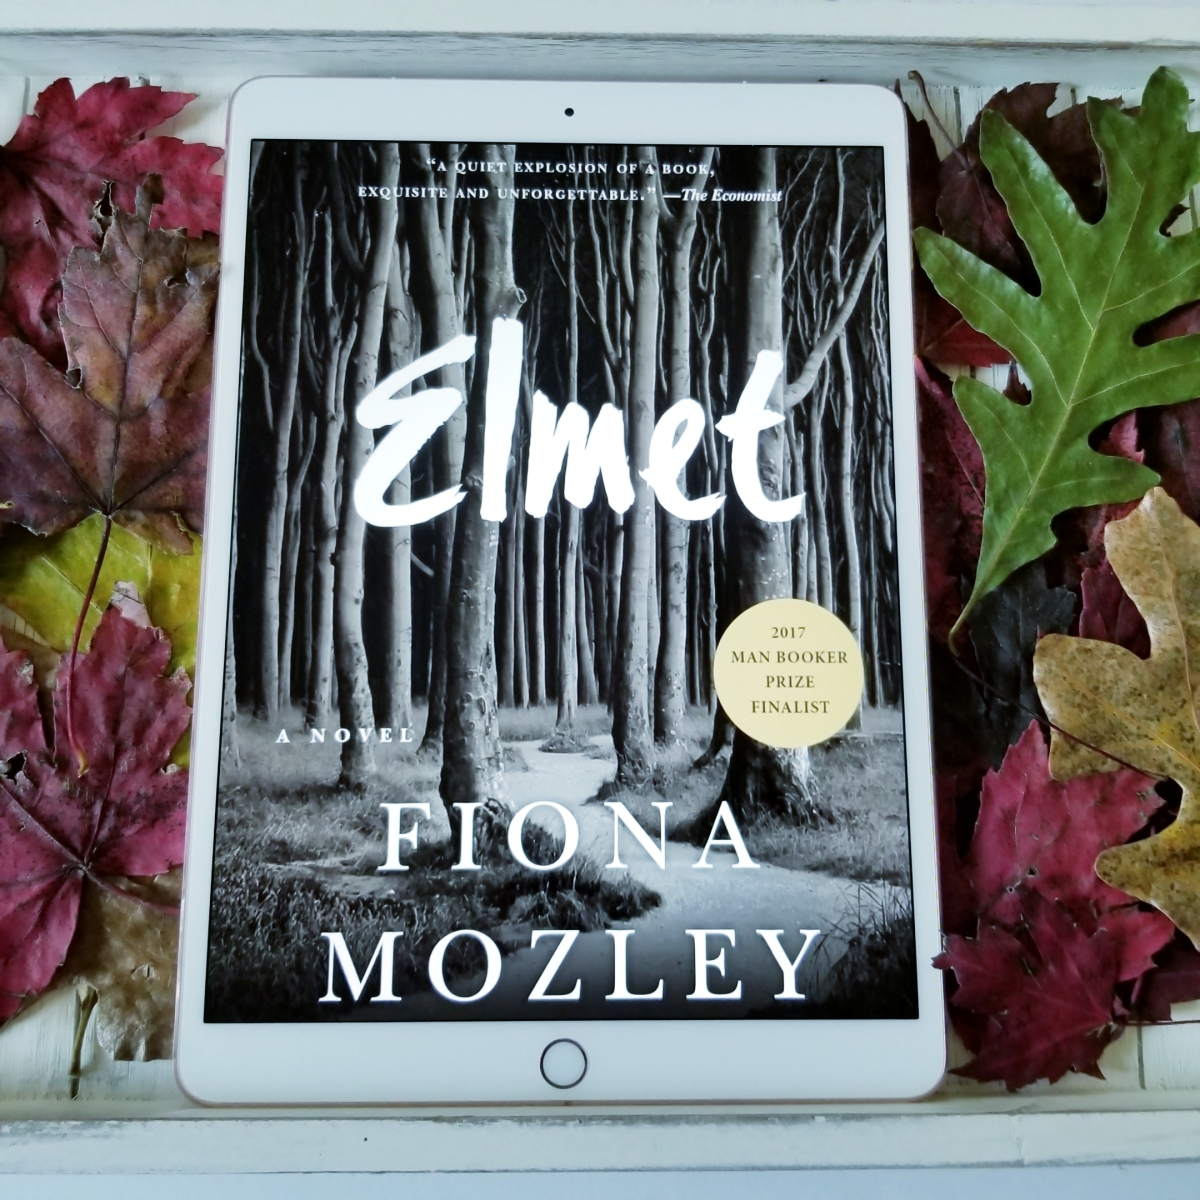 Elmet by Fiona Mozley #bookreview #tarheelreader #threlmet @fjmoz @algonquinbooks #elmet #buddyread #bibliobeth #thfavorites